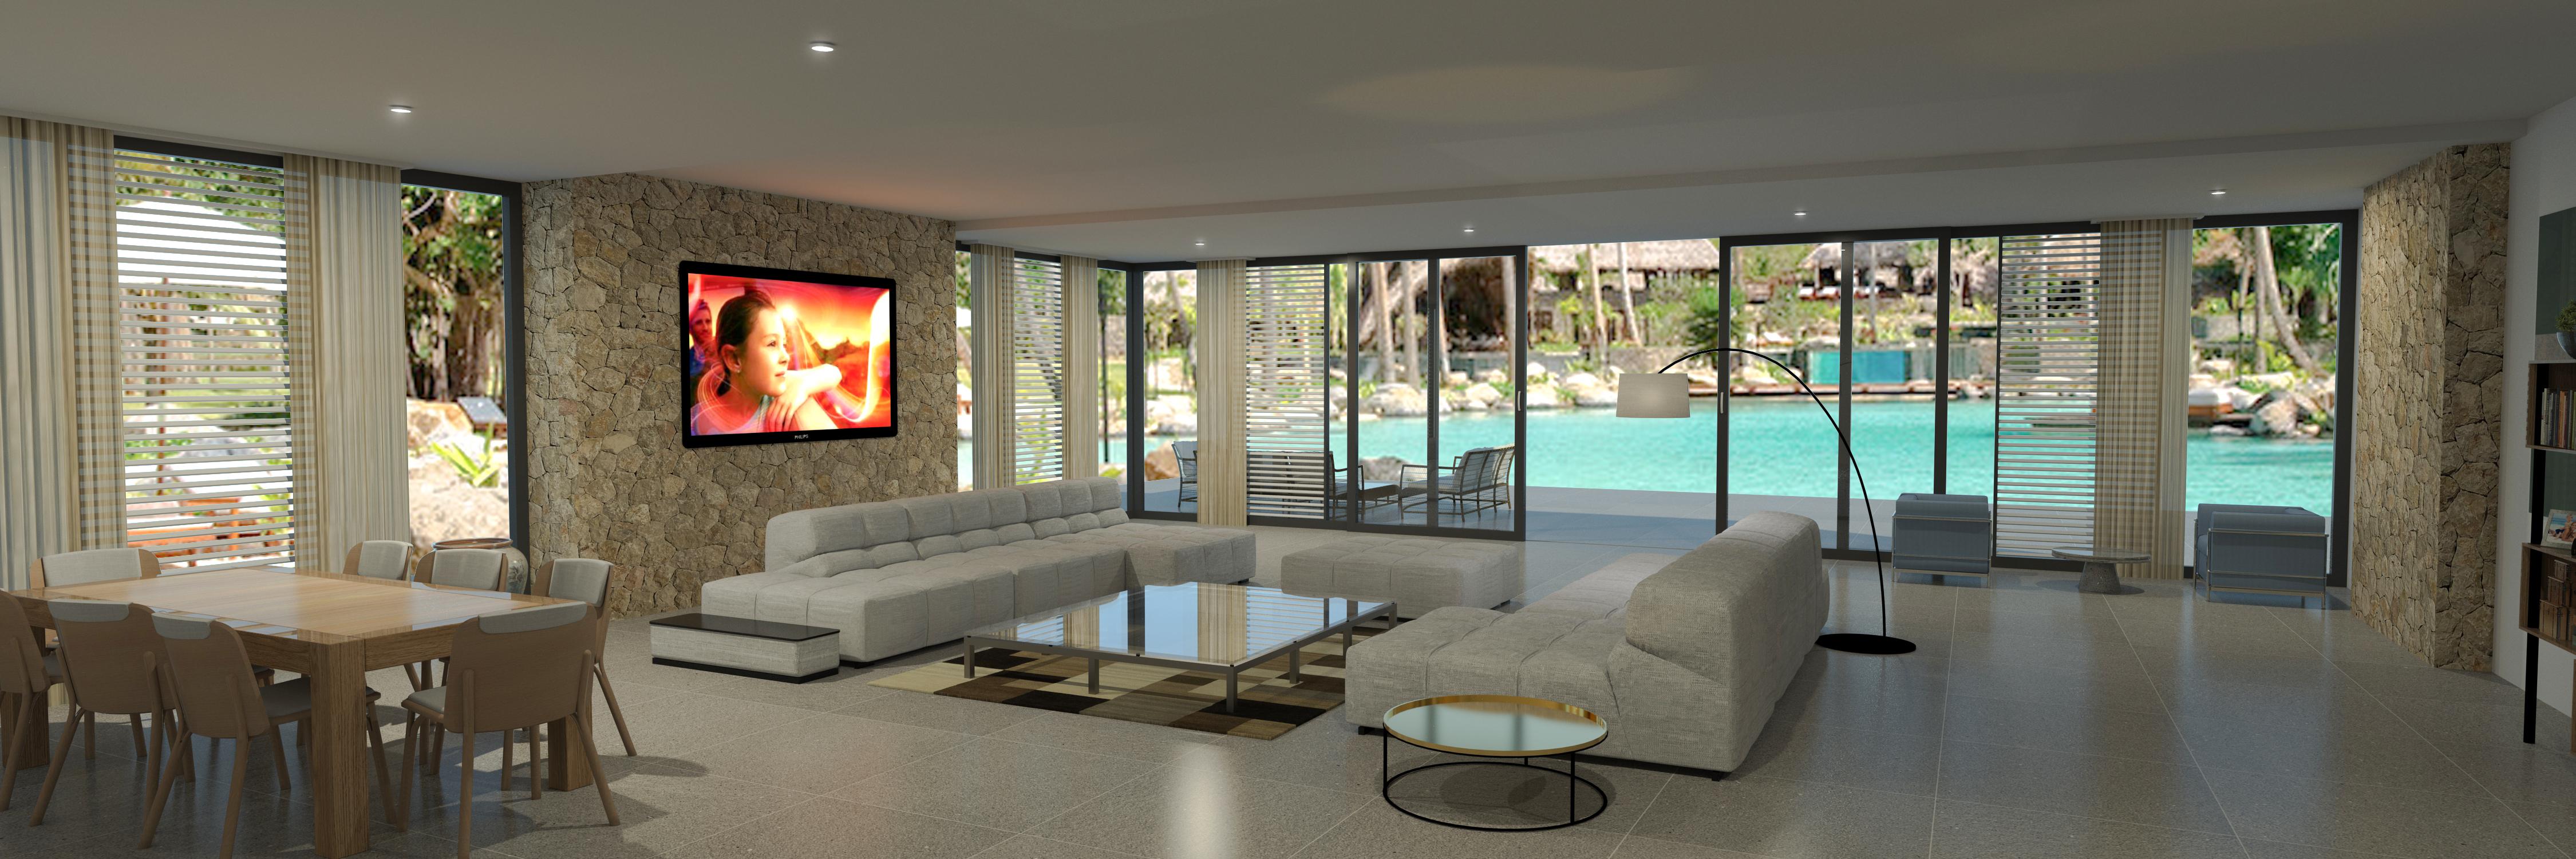 Livingroom 180219